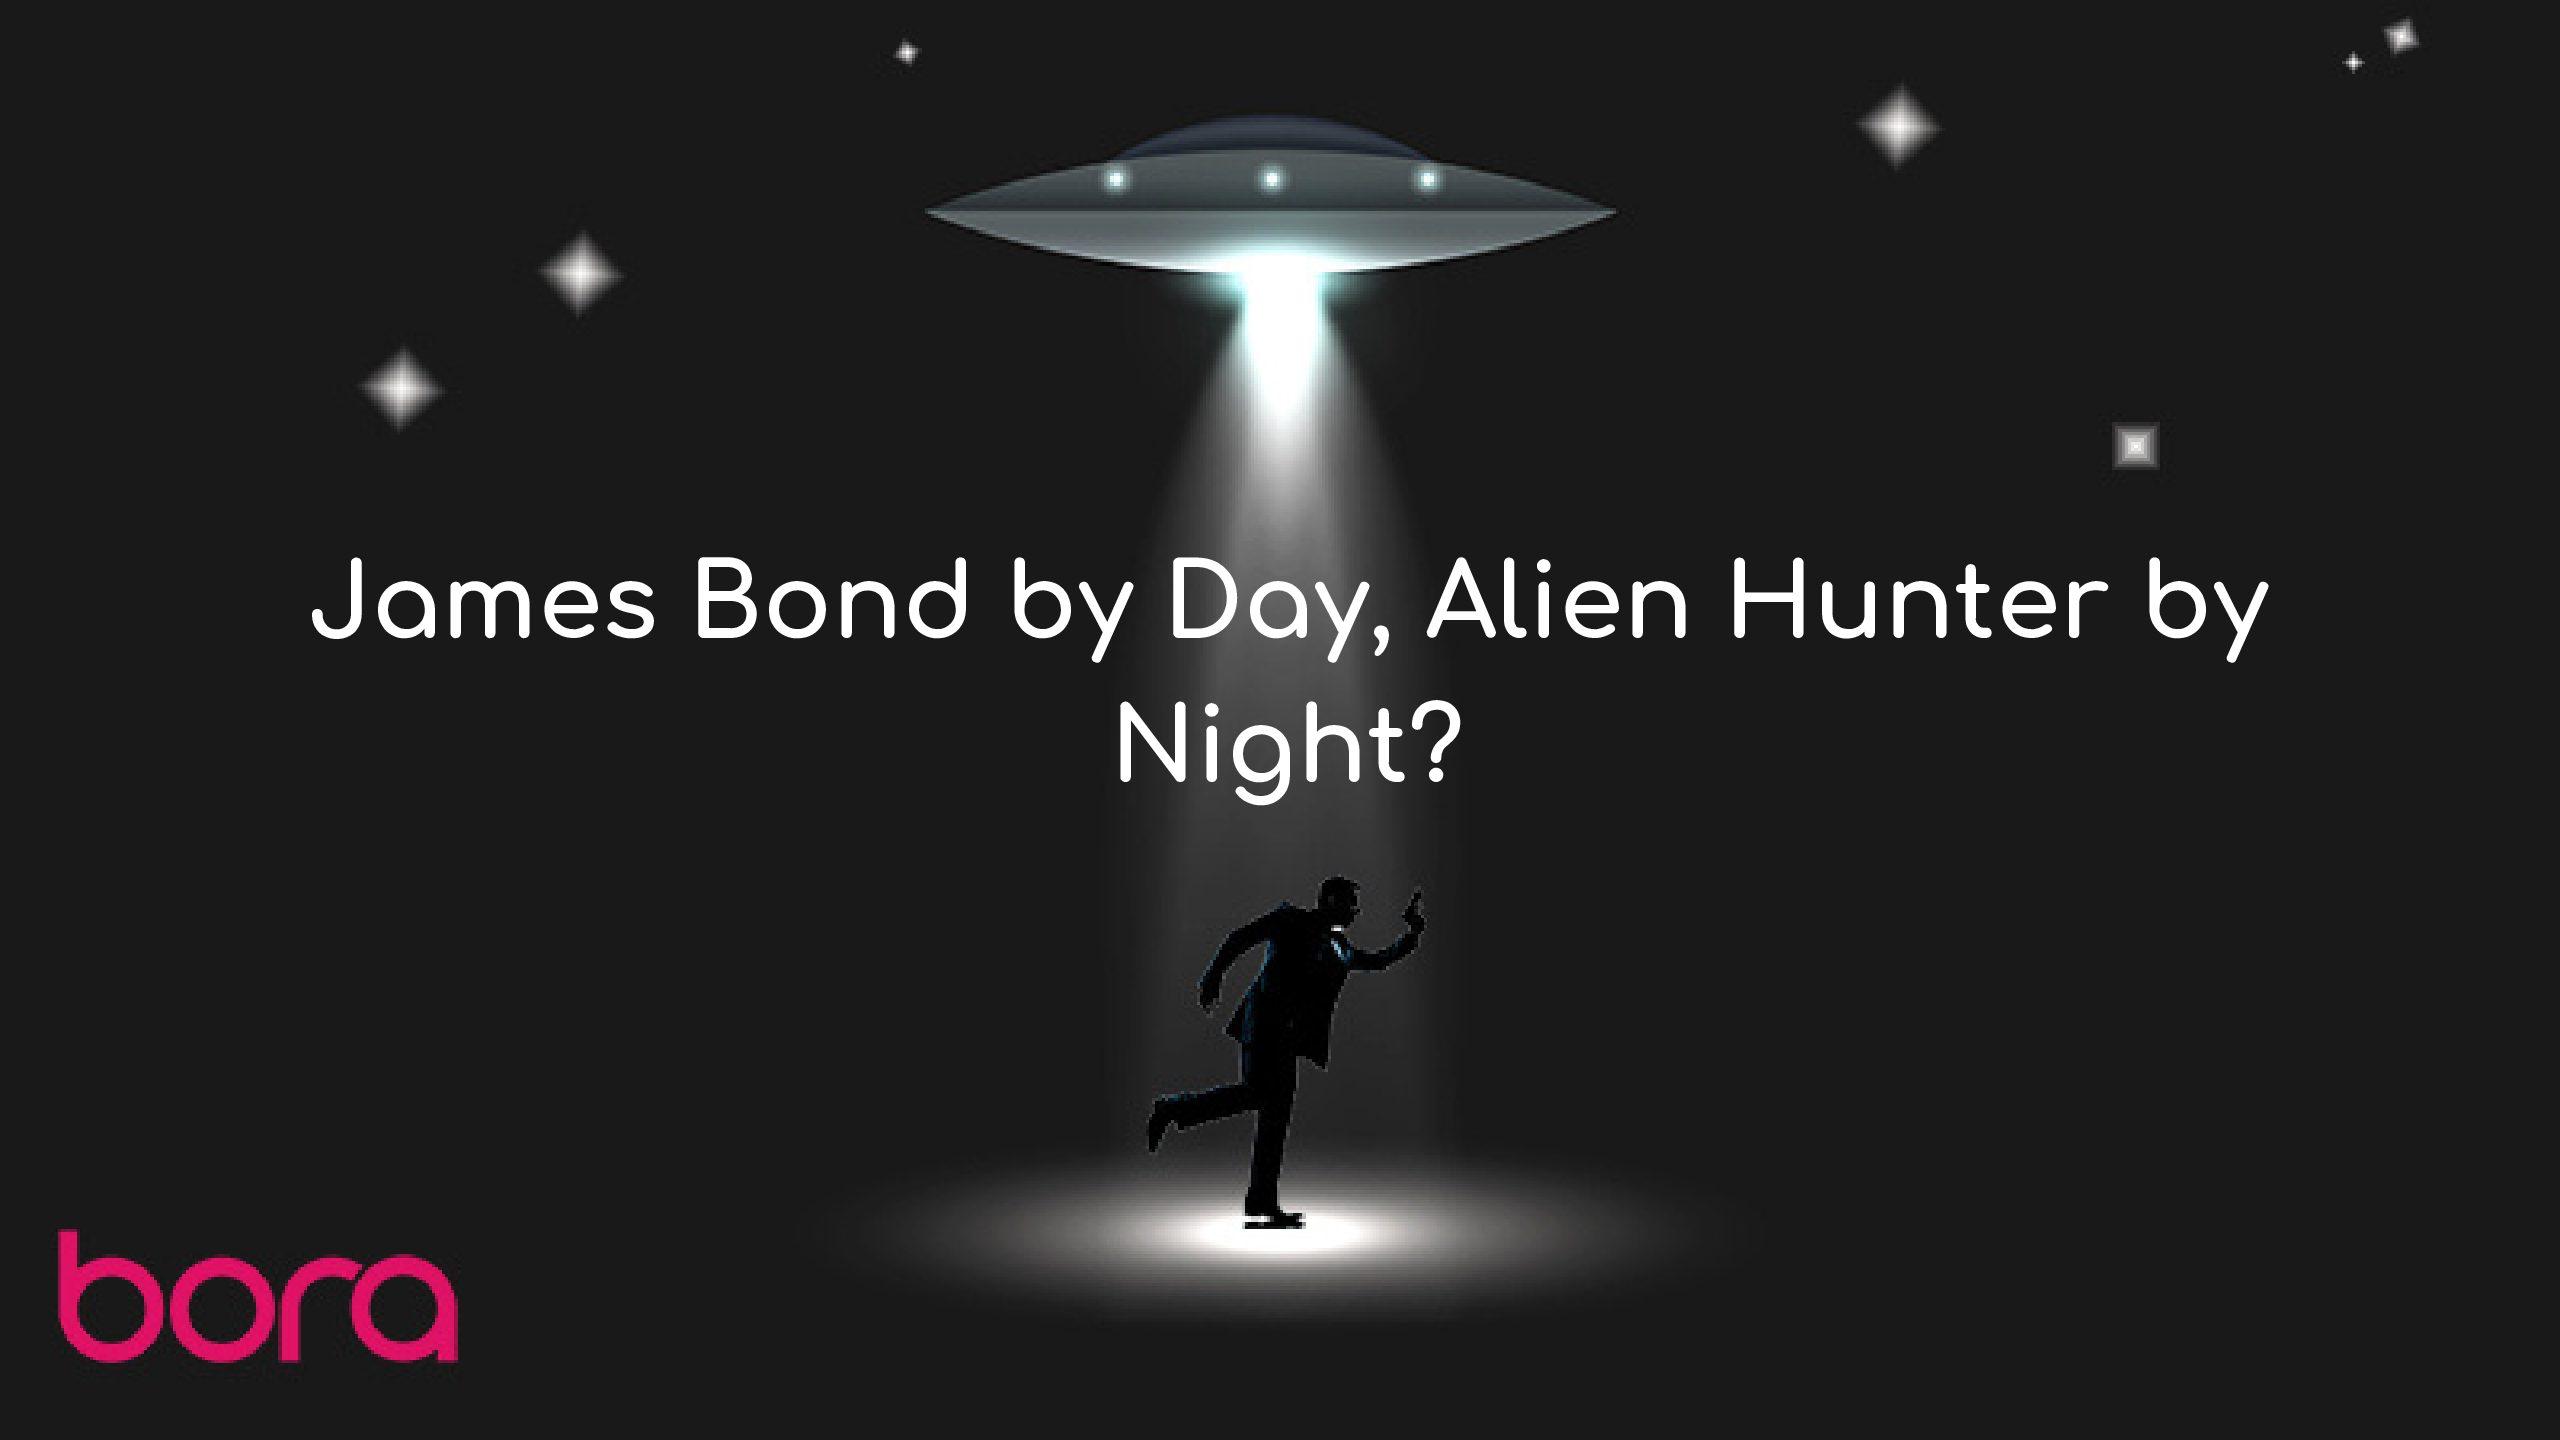 James Bond by Day, Alien Hunter by Night